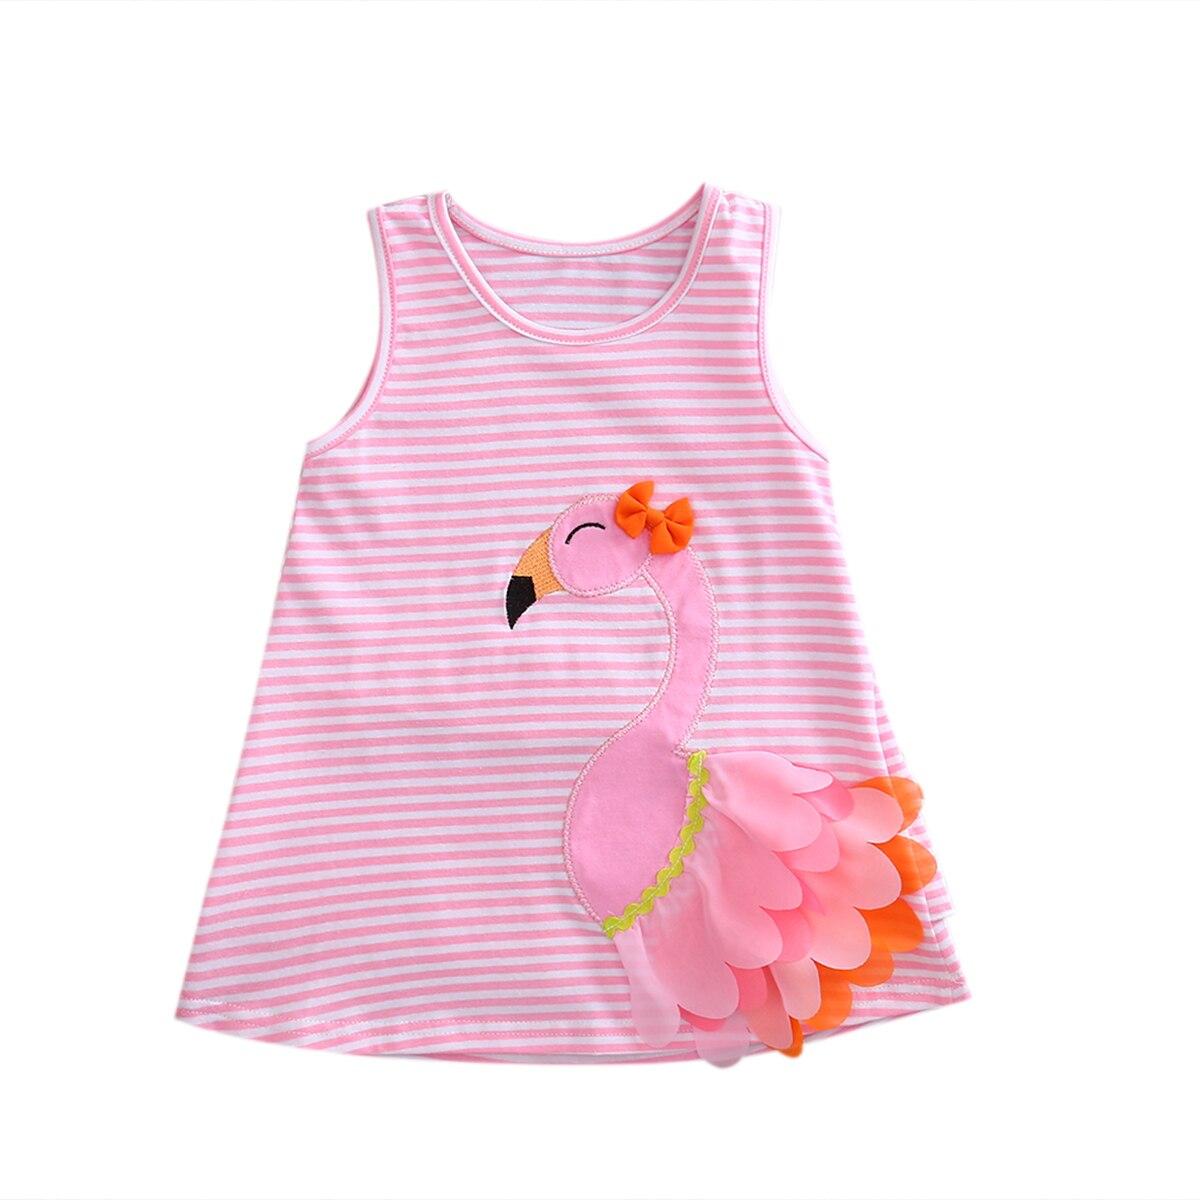 2017 Summer Girl Dress New Kids Clothing Flamingo Pattern Applique font b Baby b font Girl